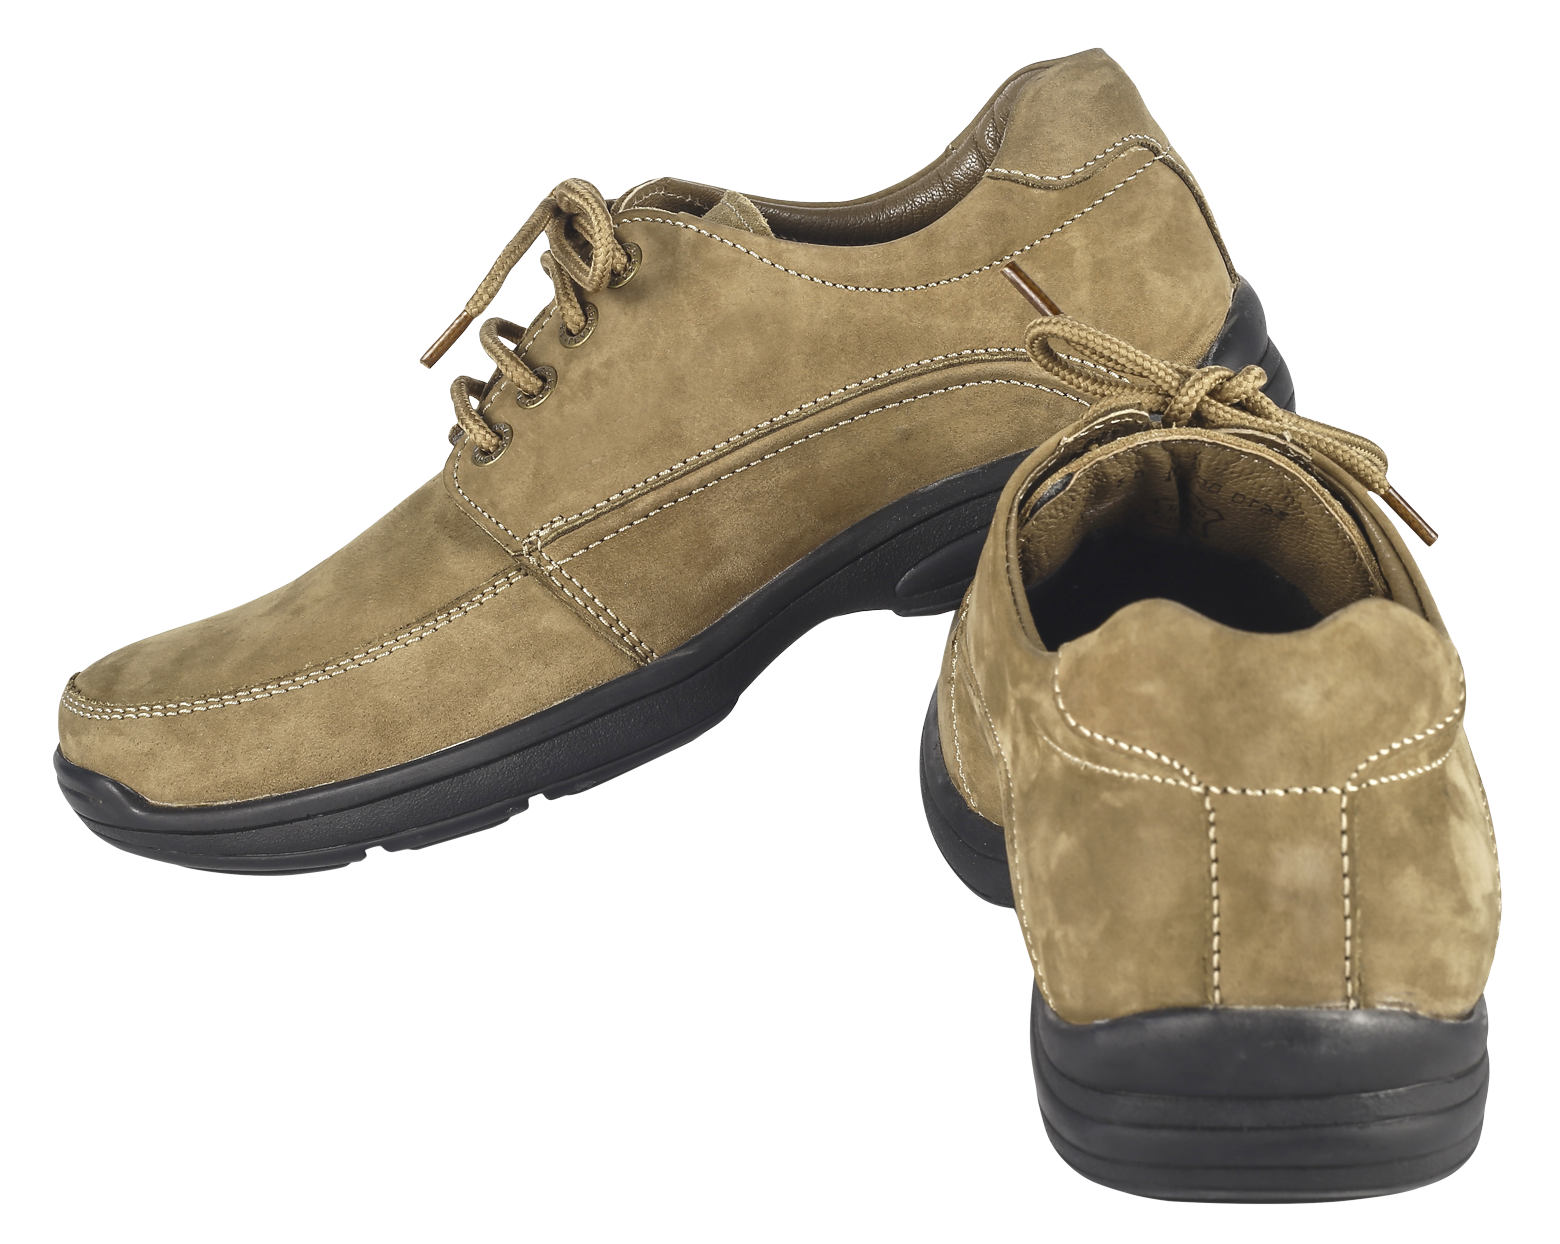 Shoe PNG Transparent Image.